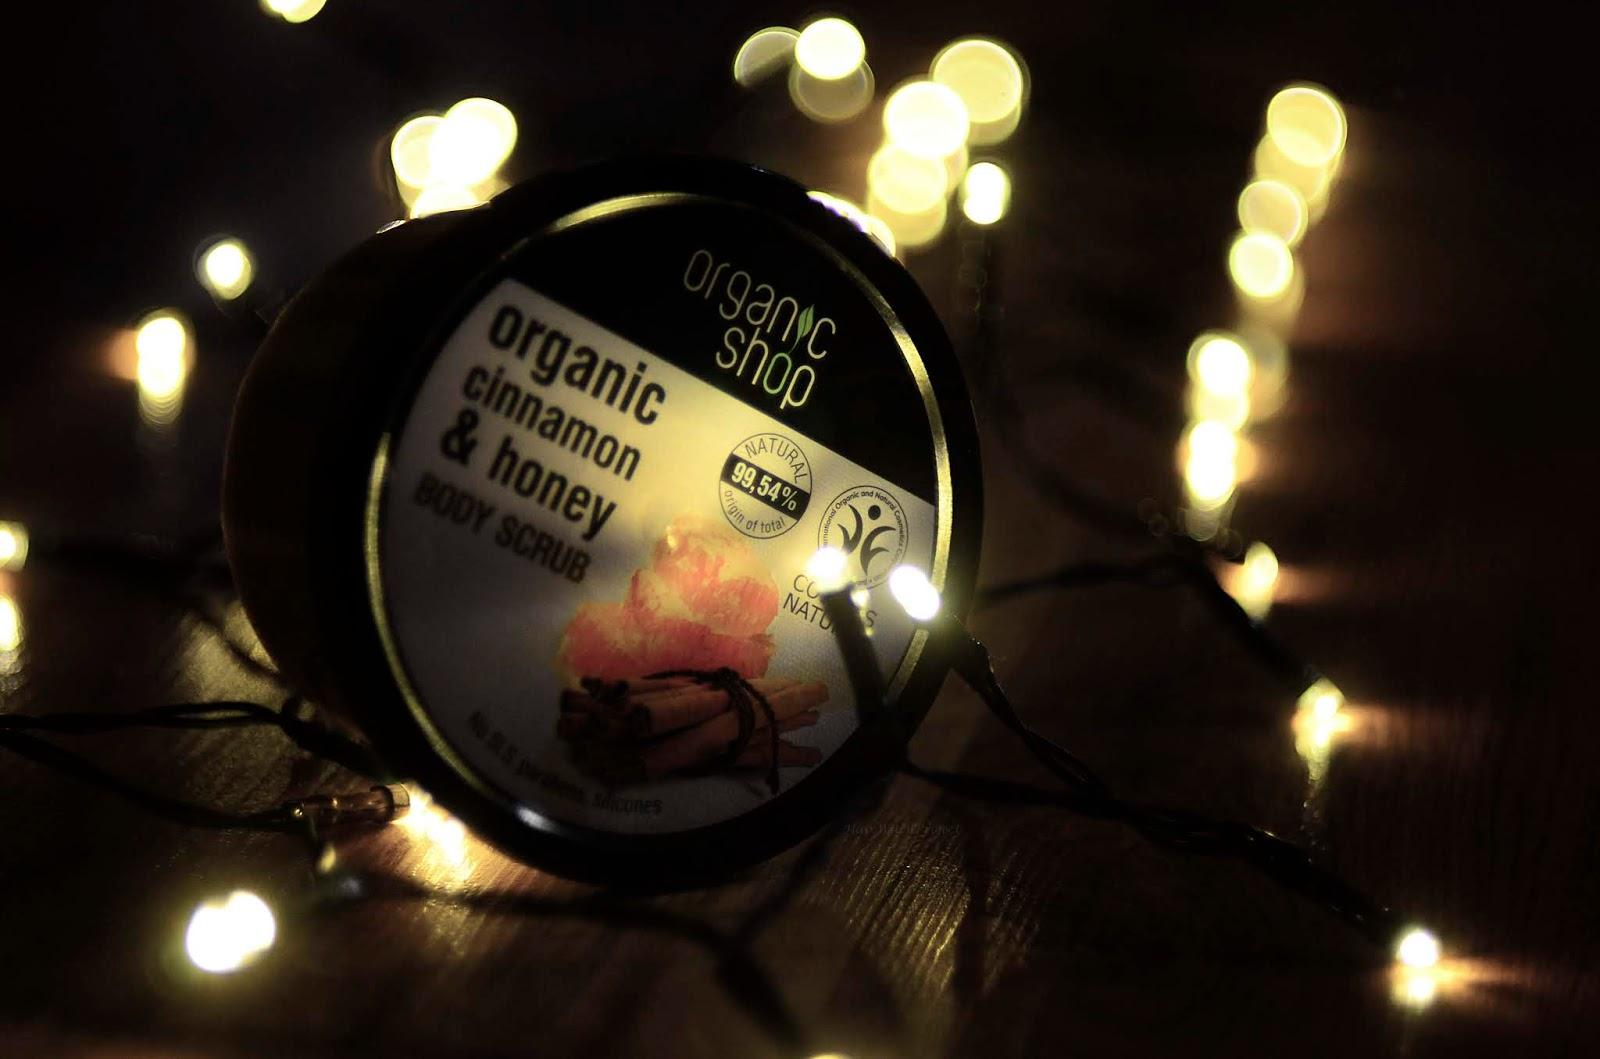 kosmetyki | organic | organic shop | ciało | peeling | cynamon | miód